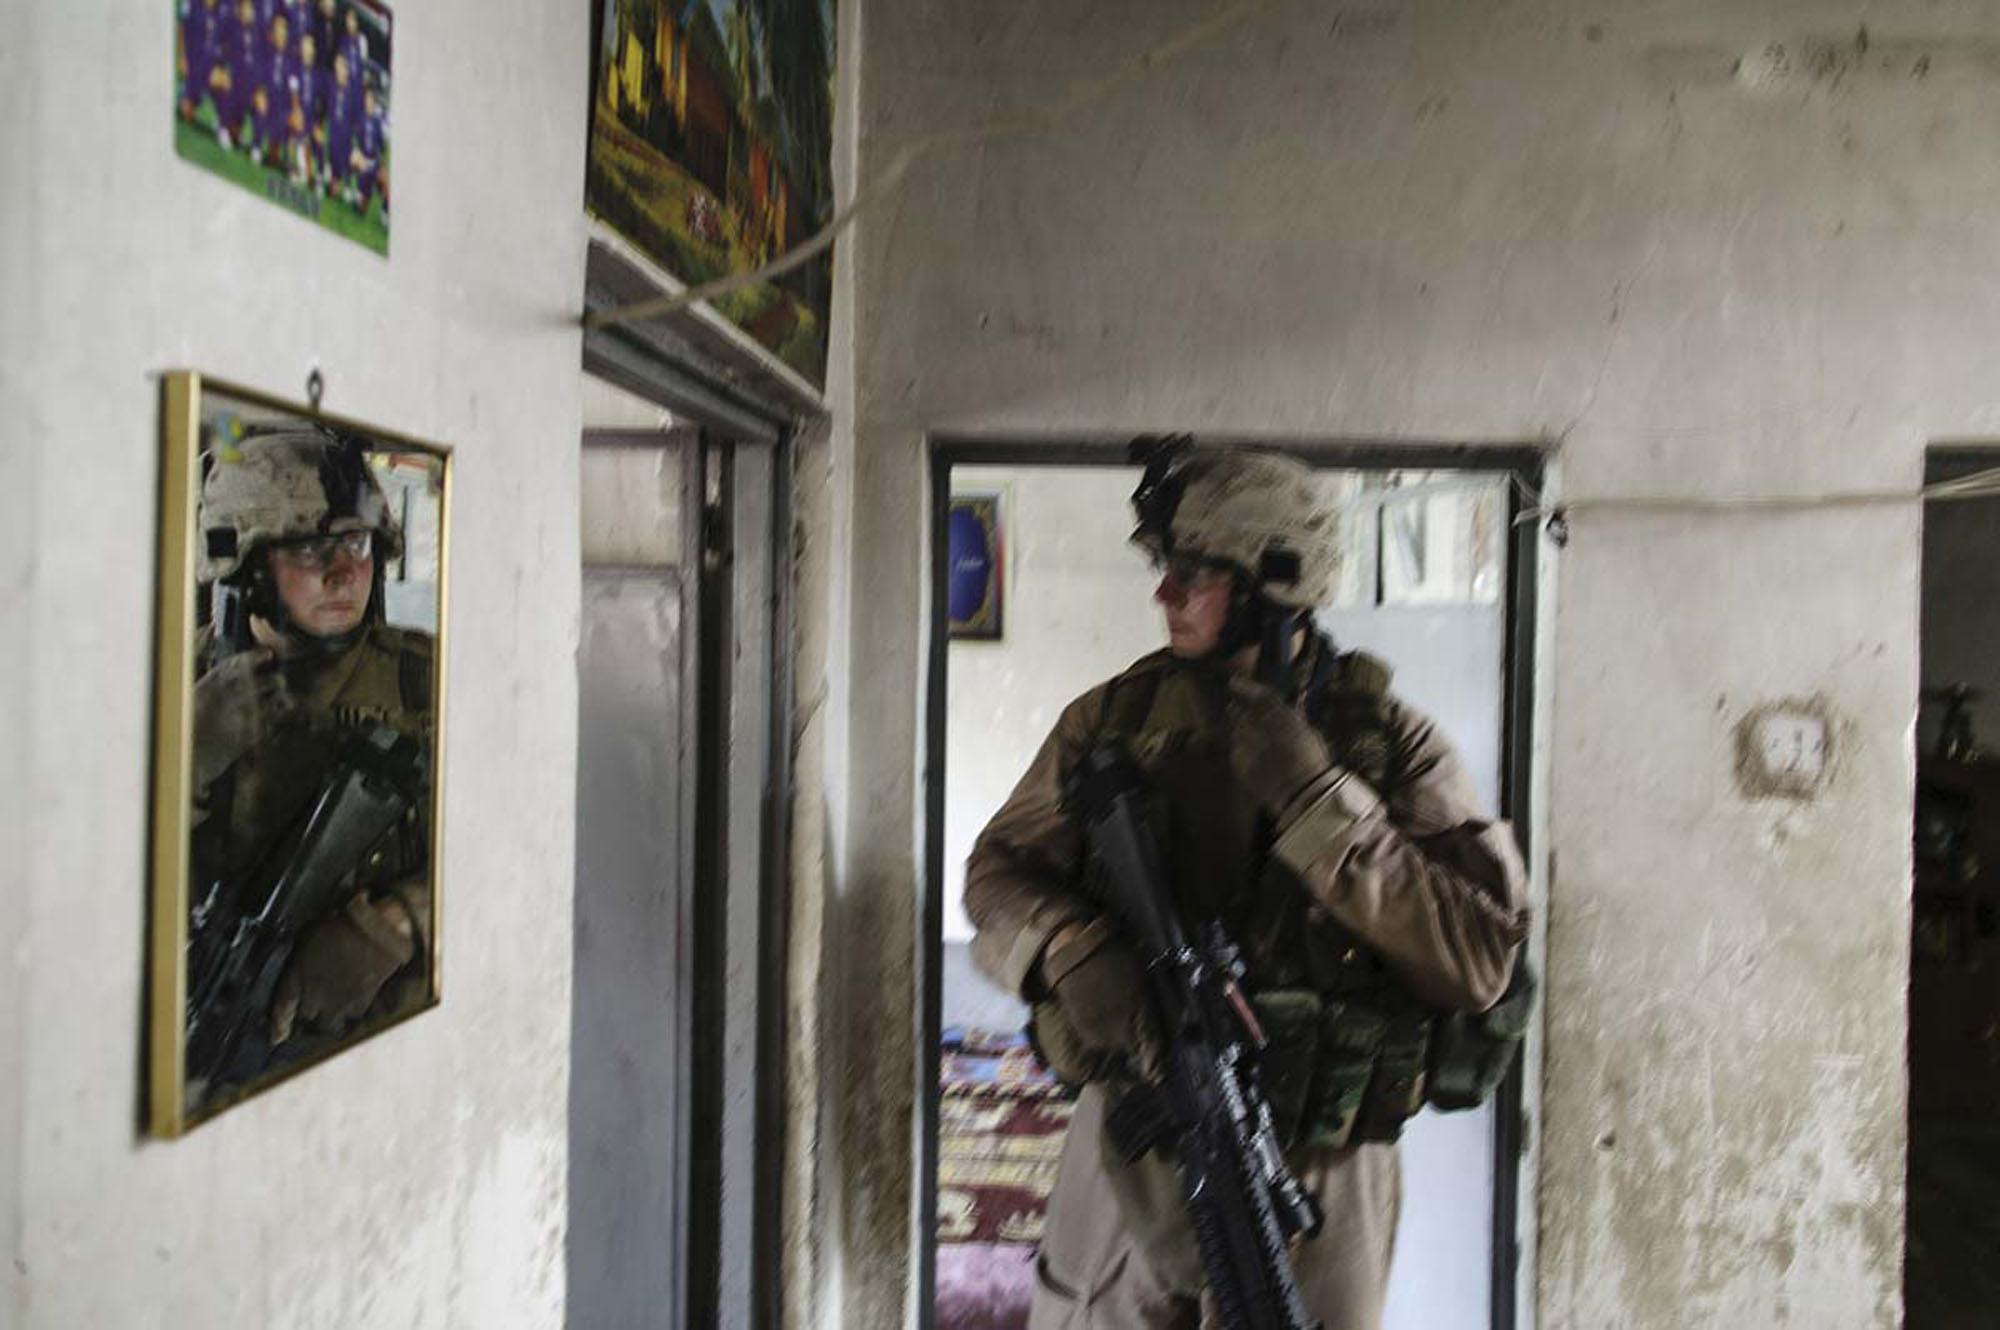 Iraq | Photojournalism | Iraq war photography | Álvaro Ybarra Zavala